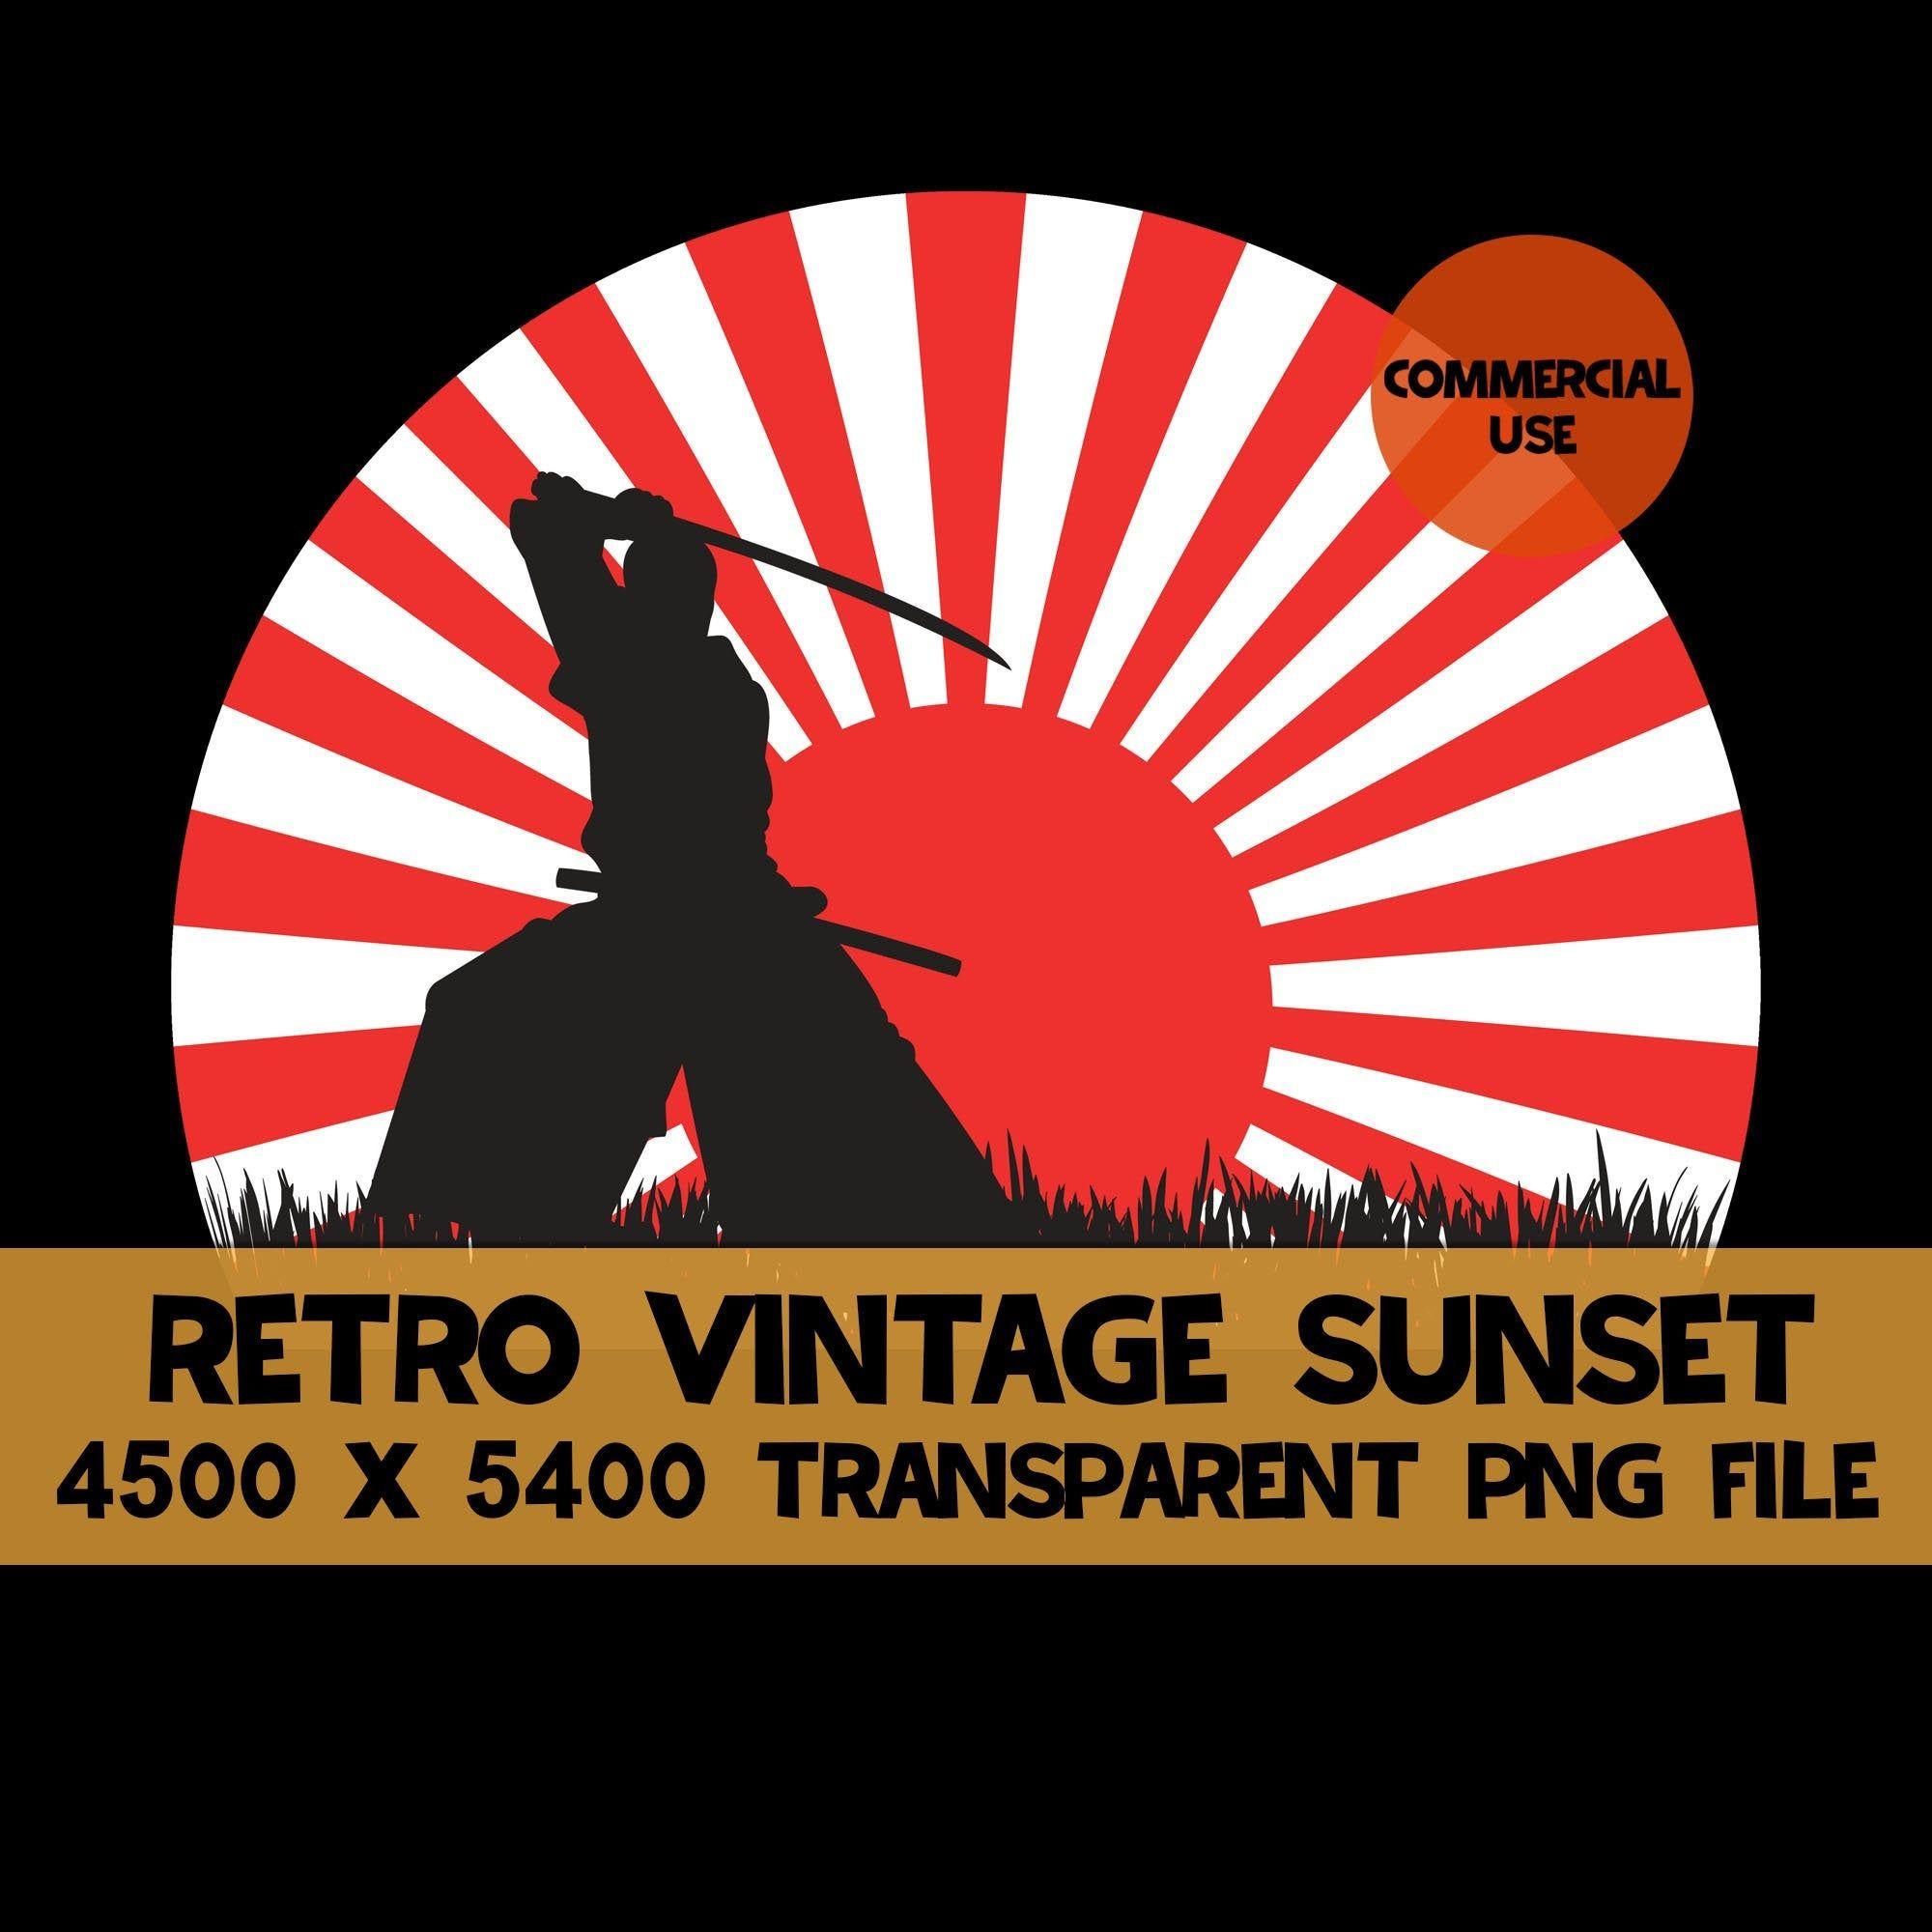 Samurai Japanese Warrior Red Rising Sun Sunset Clip Art Png File Sunrise Rays Instant Download Template Commercia Japanese Warrior Clip Art Retro Color Palette